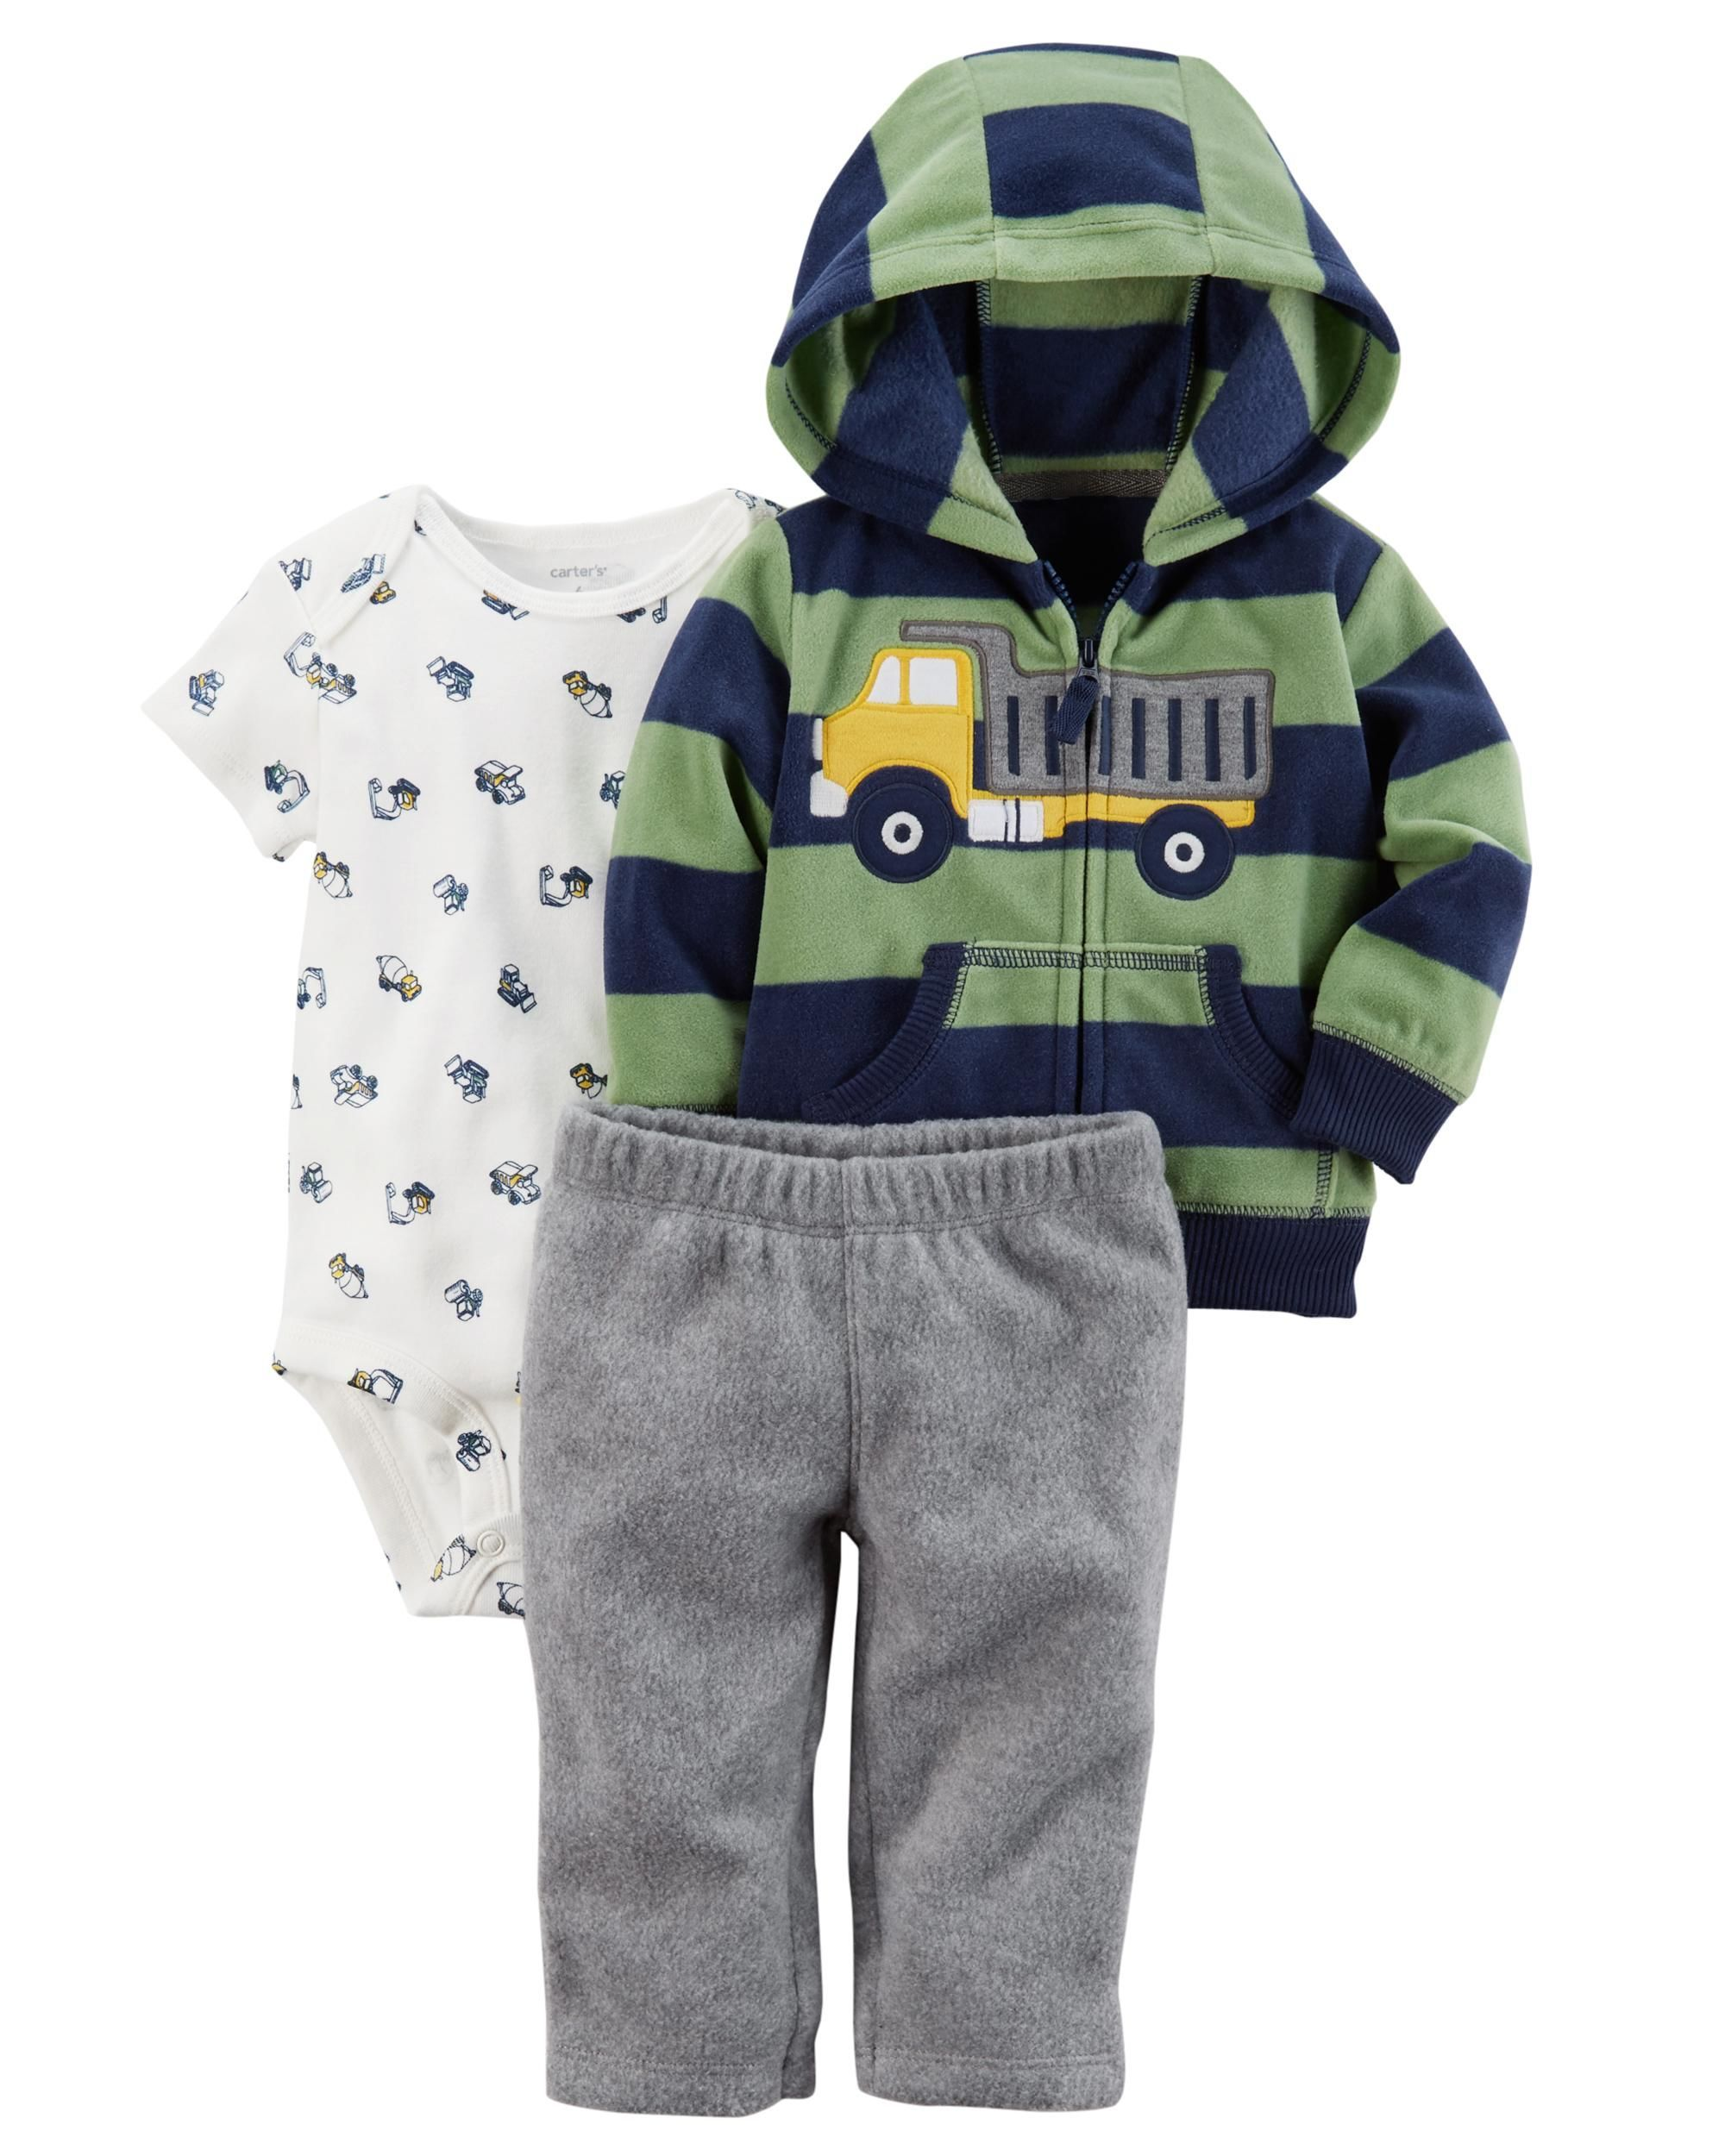 Baby Boy 3-Piece Little Jacket Set   Carters.com   Надо купить ... 99923046fd